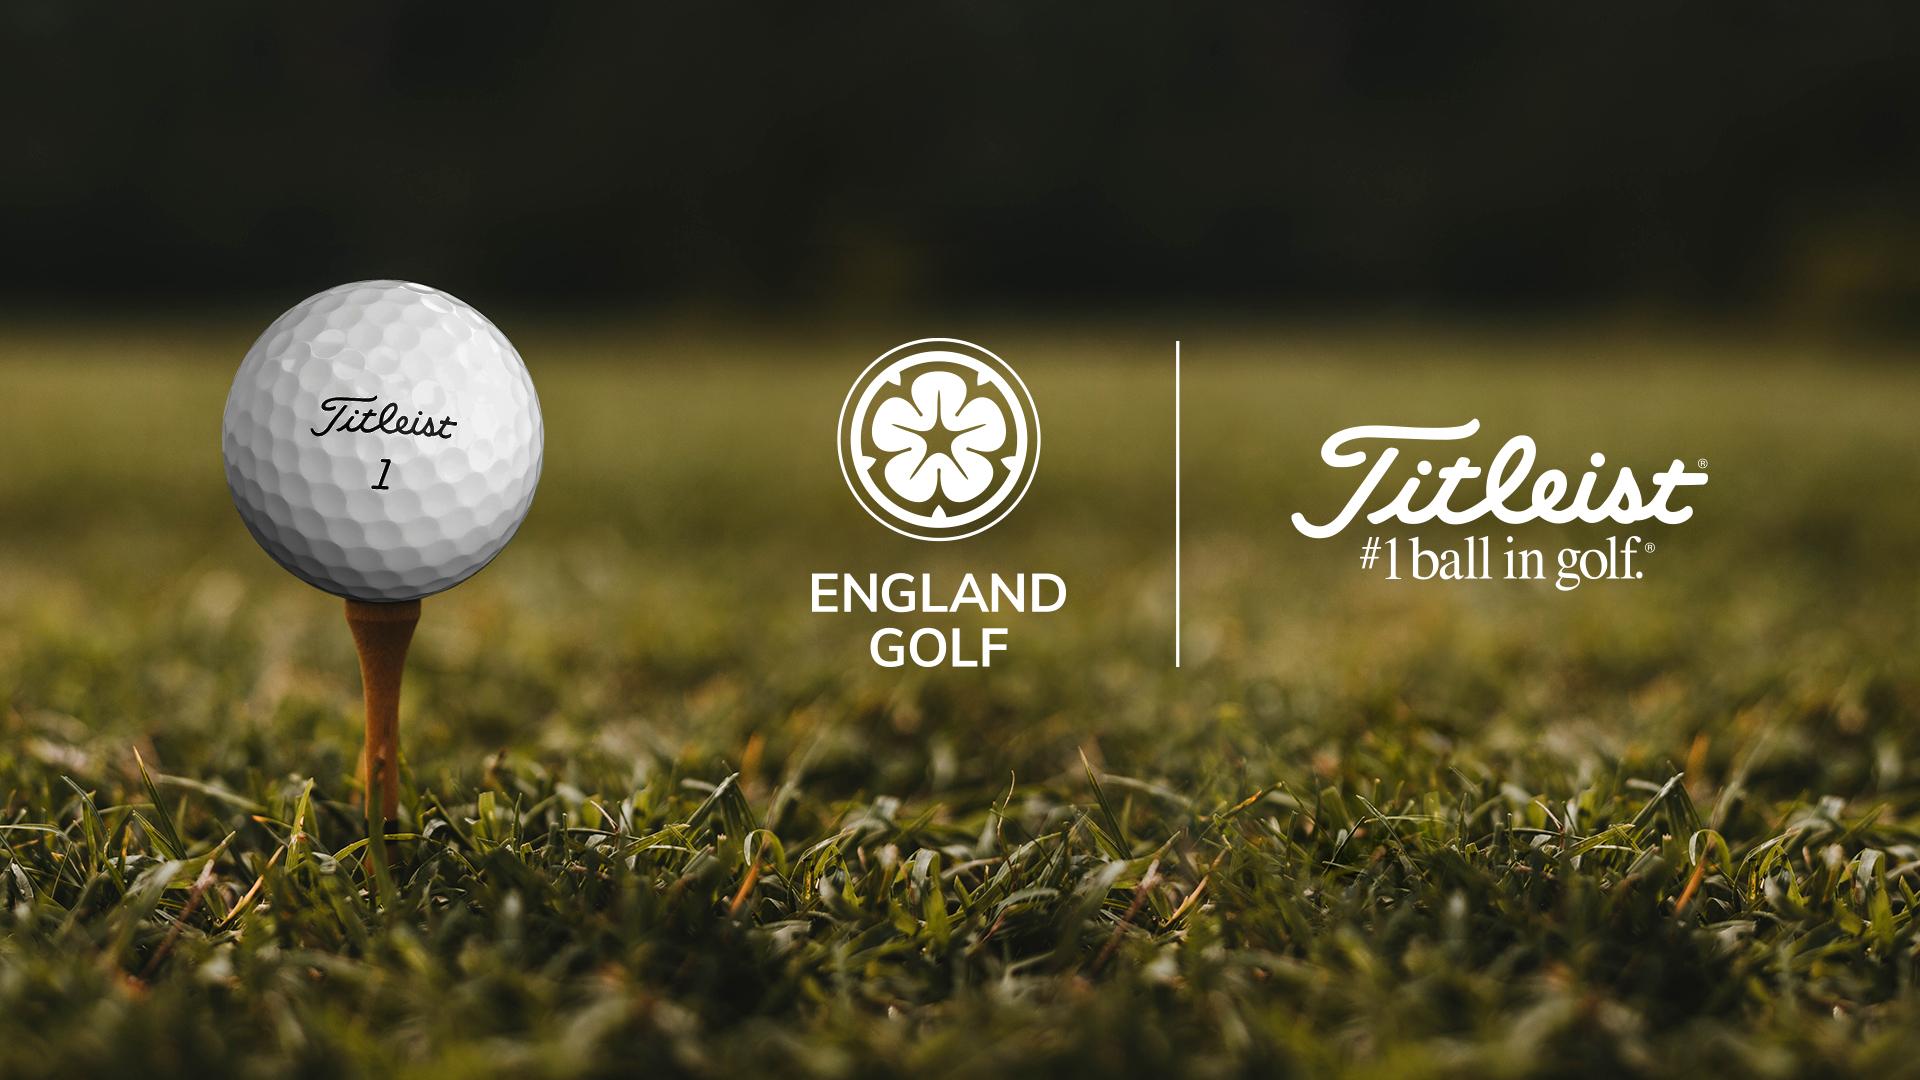 England Golf will partner with Titleist until 2023